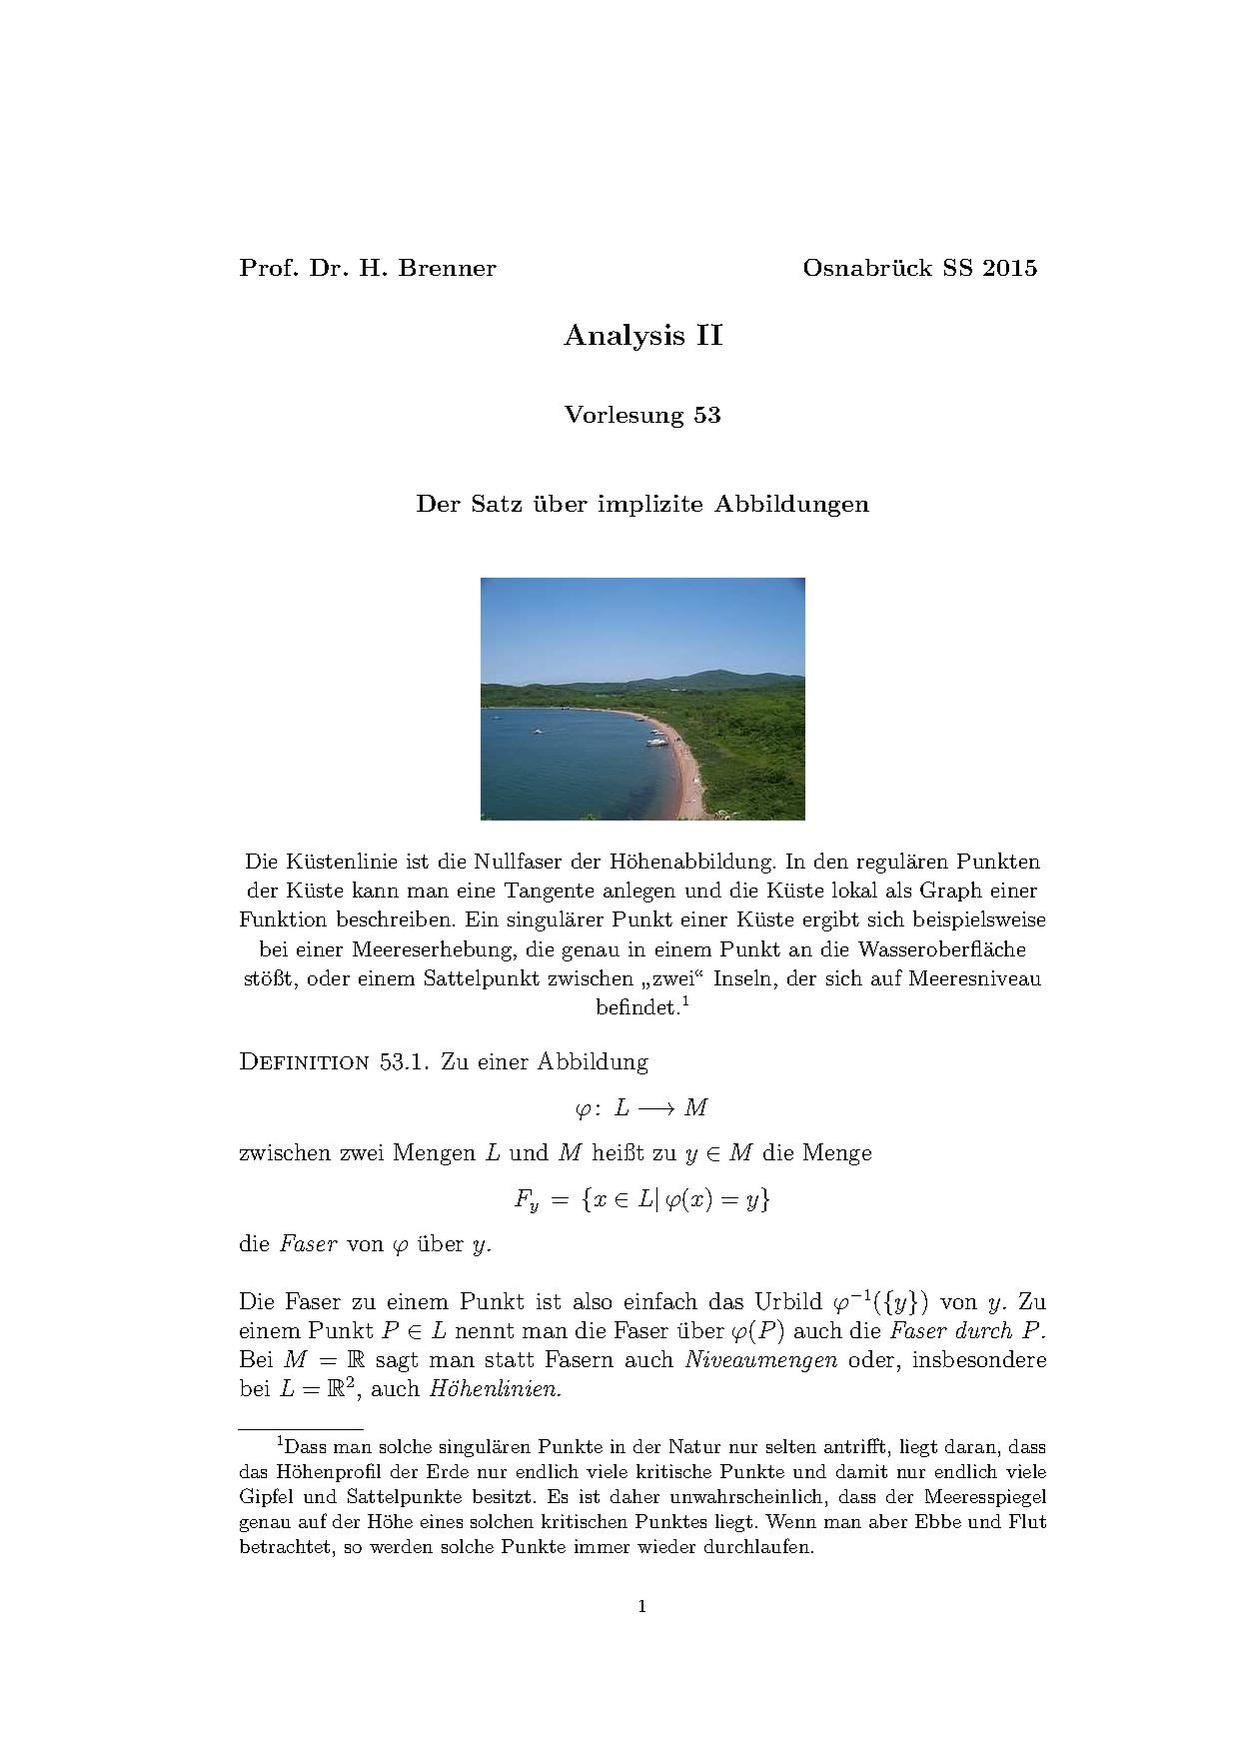 File:Analysis (Osnabrück 2014-2016)Vorlesung53.pdf - Wikimedia Commons